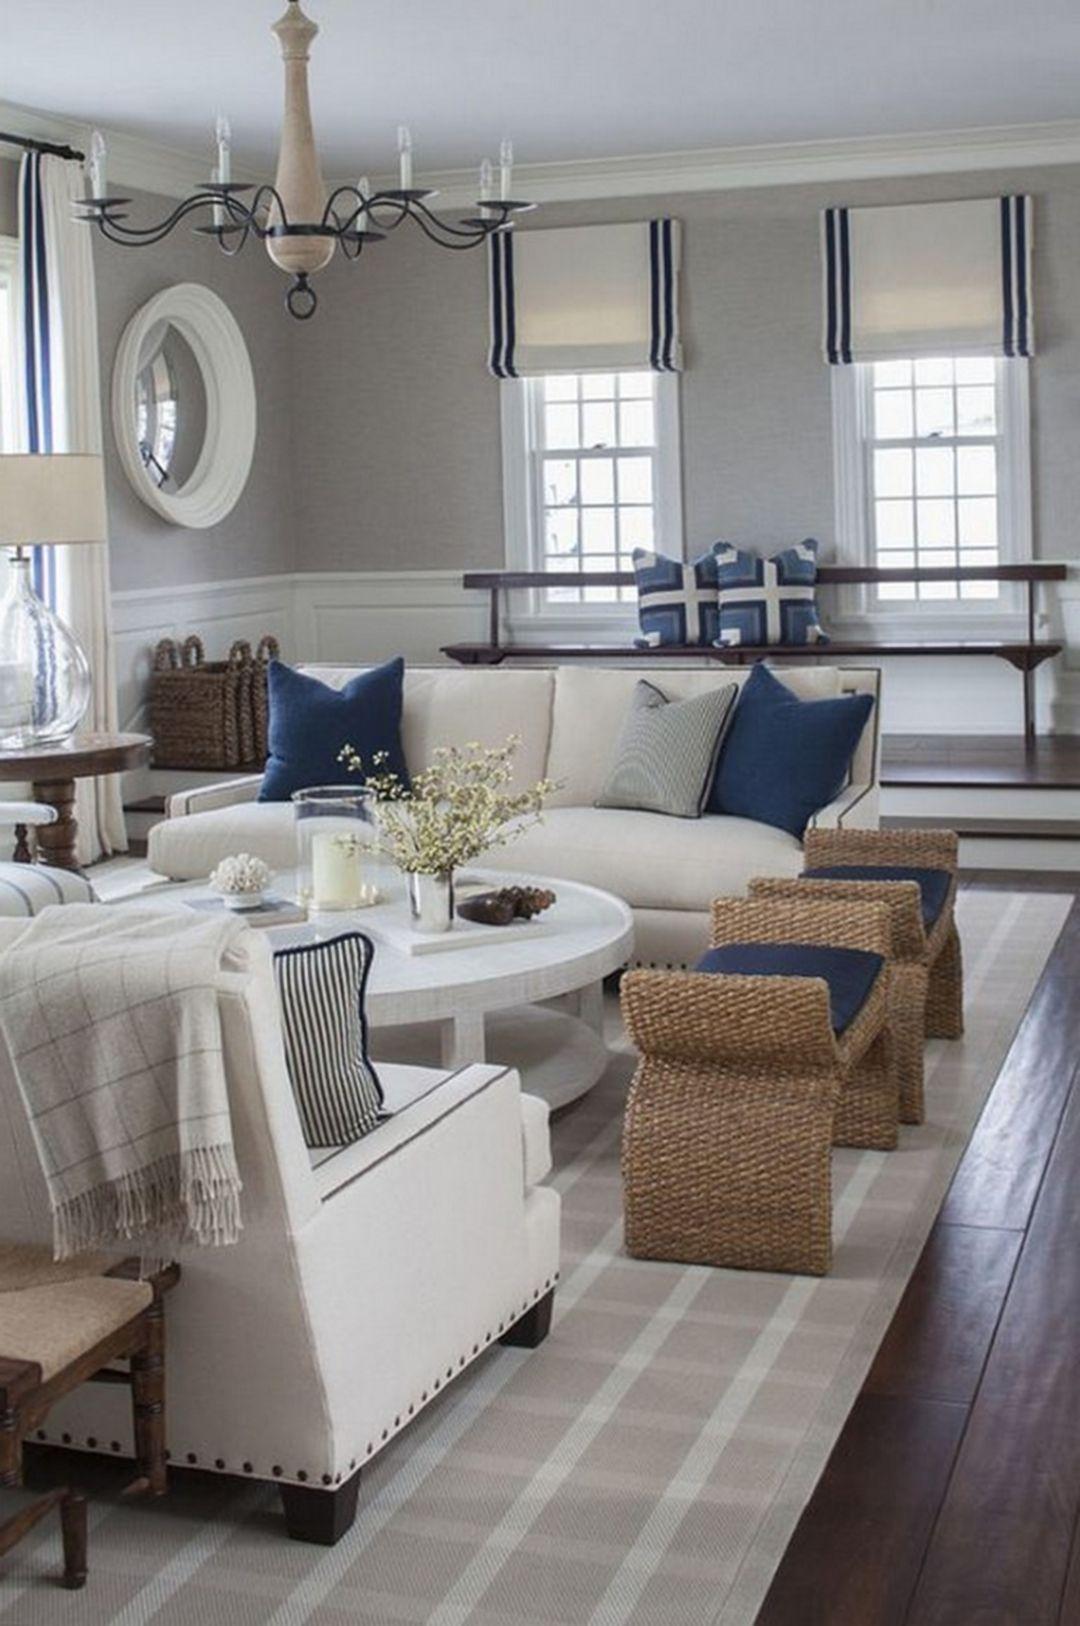 Coastal Living Room Design Ideas: 25 Unbelievable Coastal Living Room Design Ideas For Your